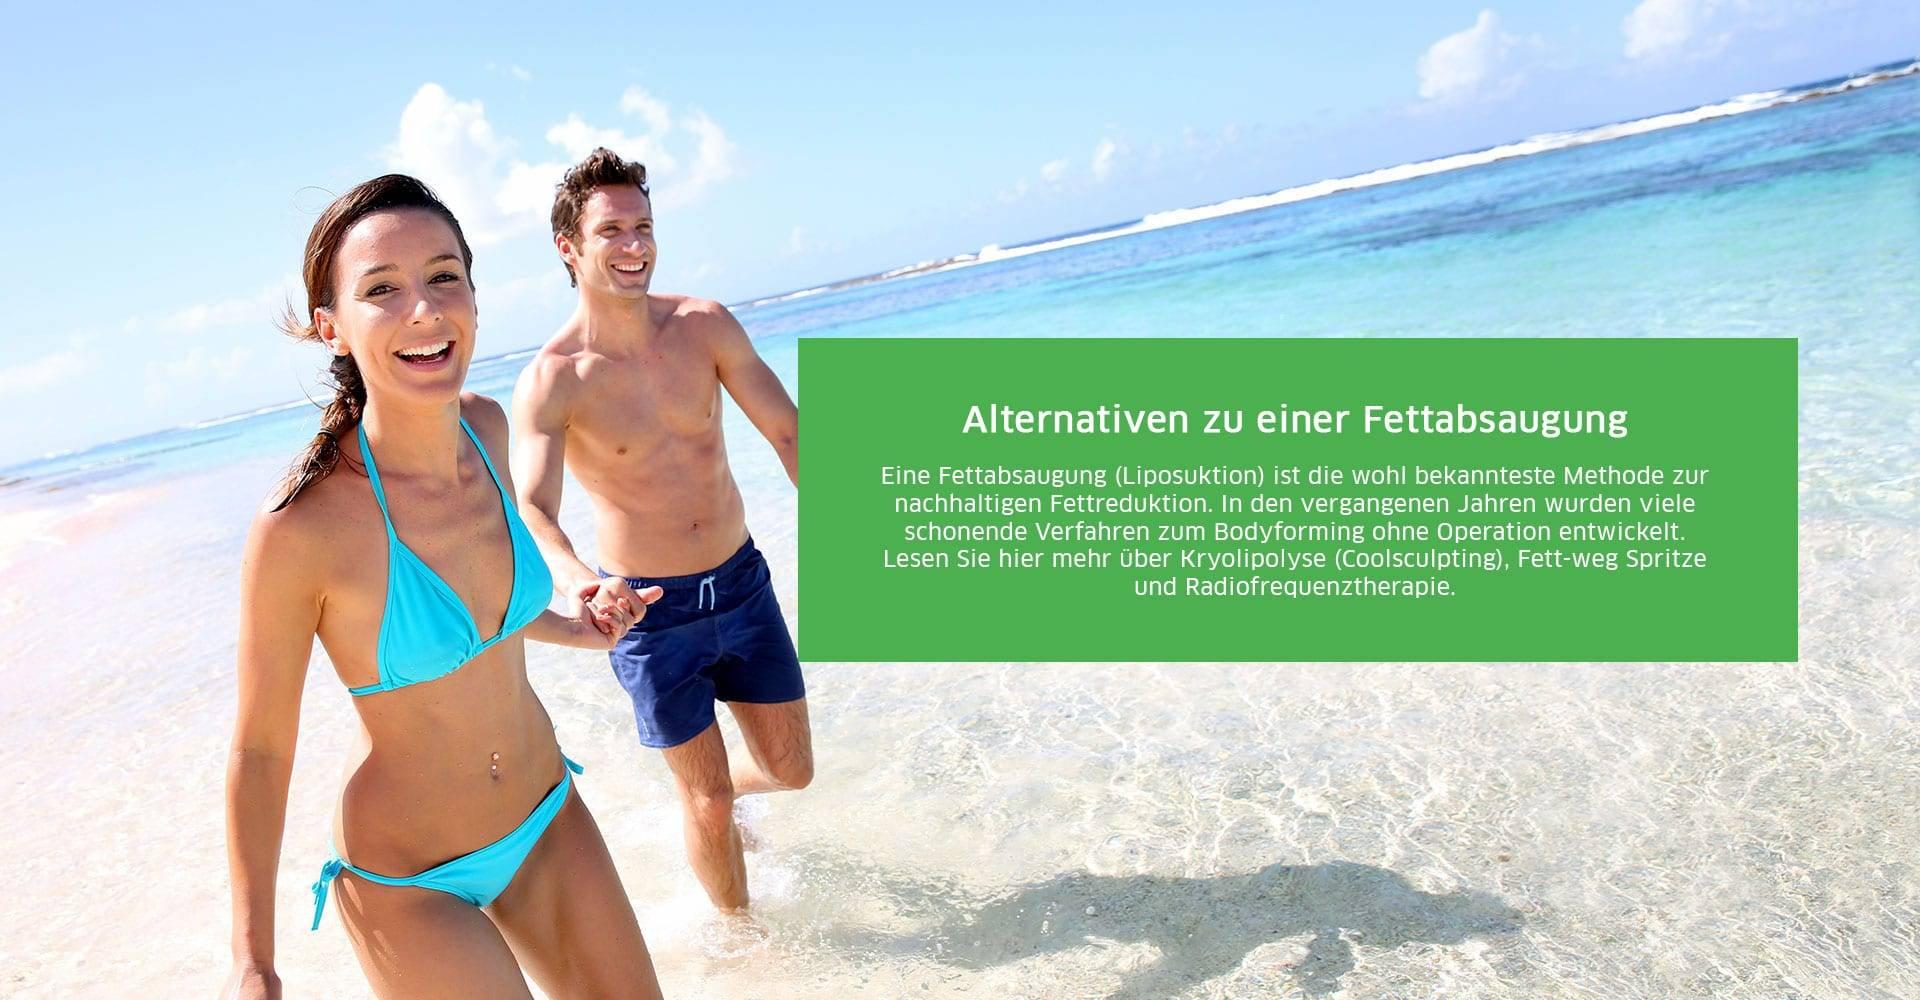 fettabsaugung_oberarme_muenchenn_alternative_behandlungen